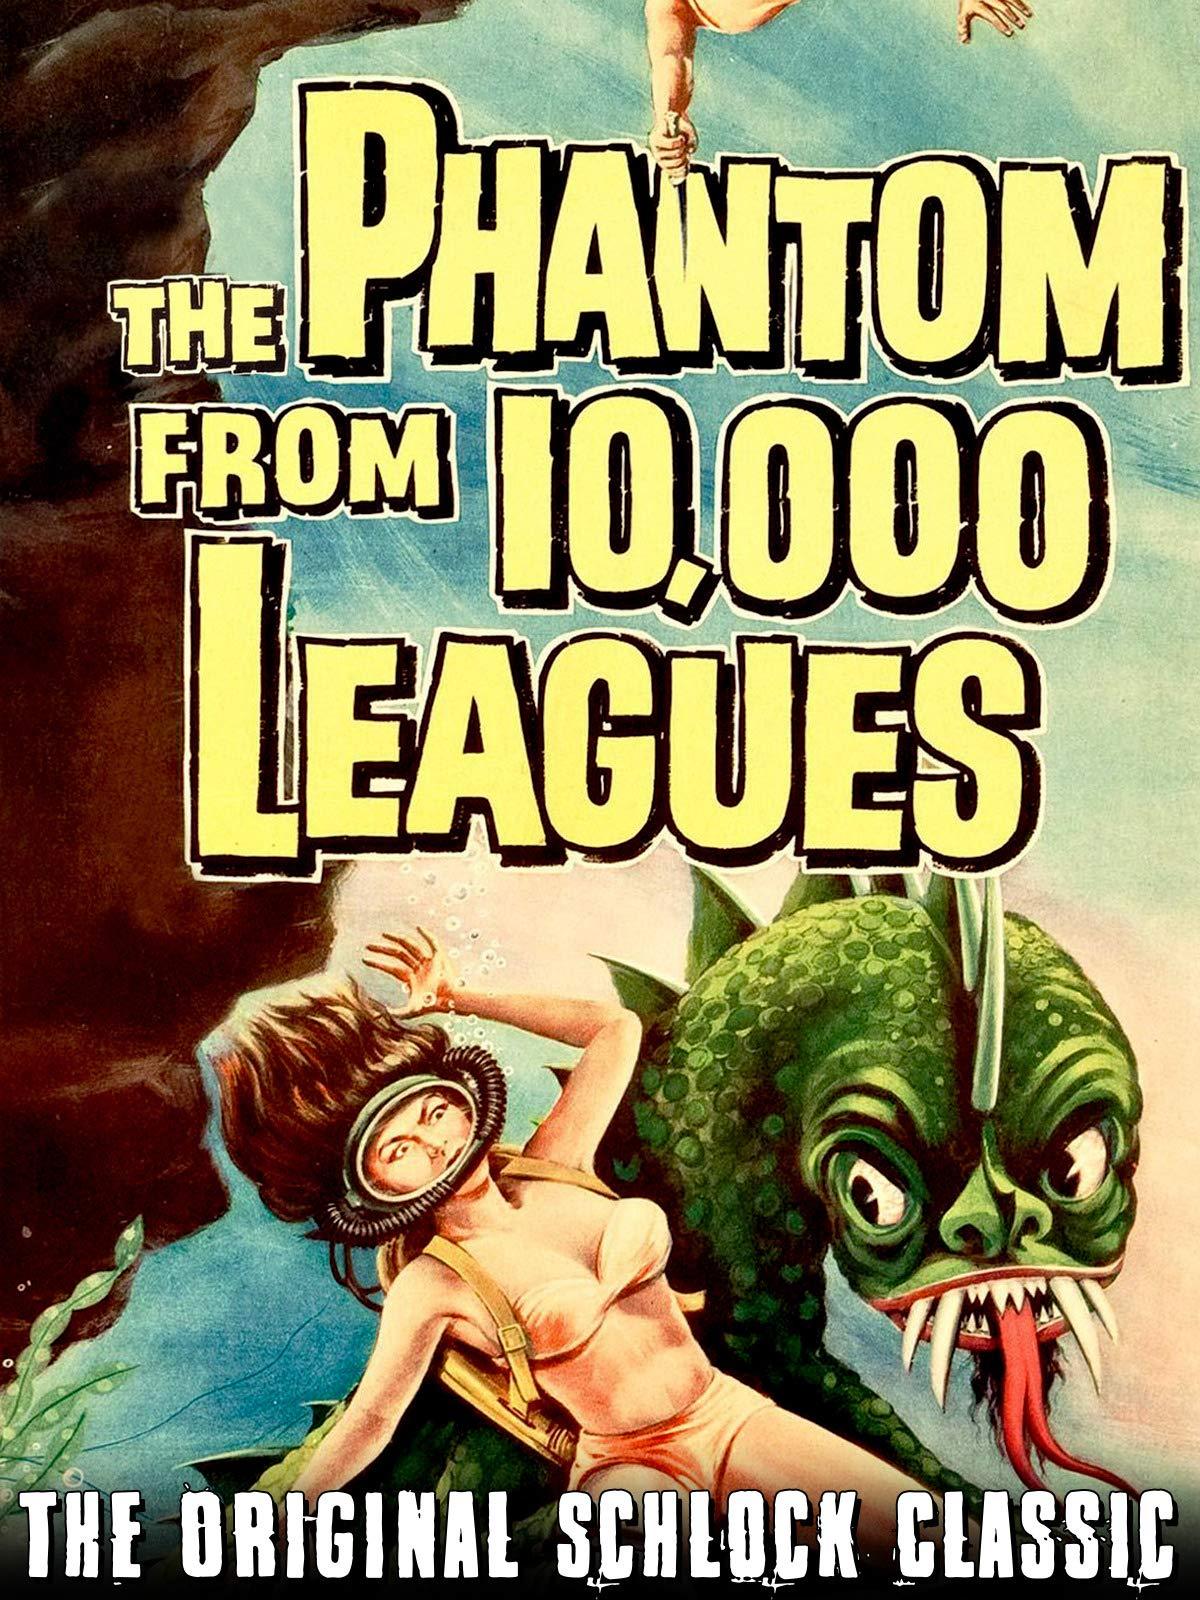 Phantom From 10,000 Leagues - The Original Schlock Classic